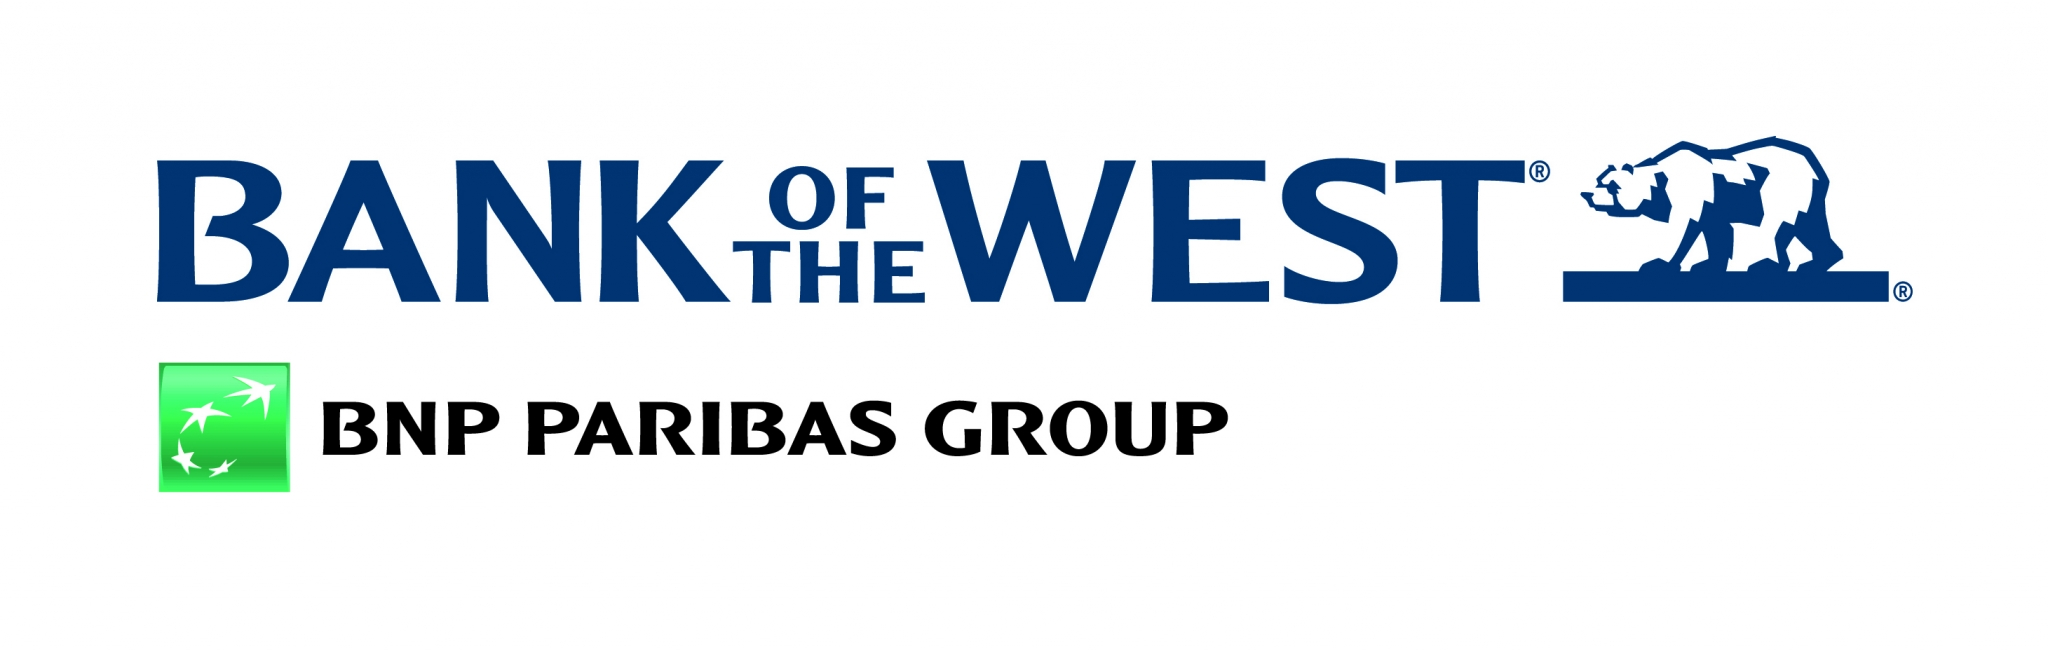 BOTW-Logo-Summit-2020